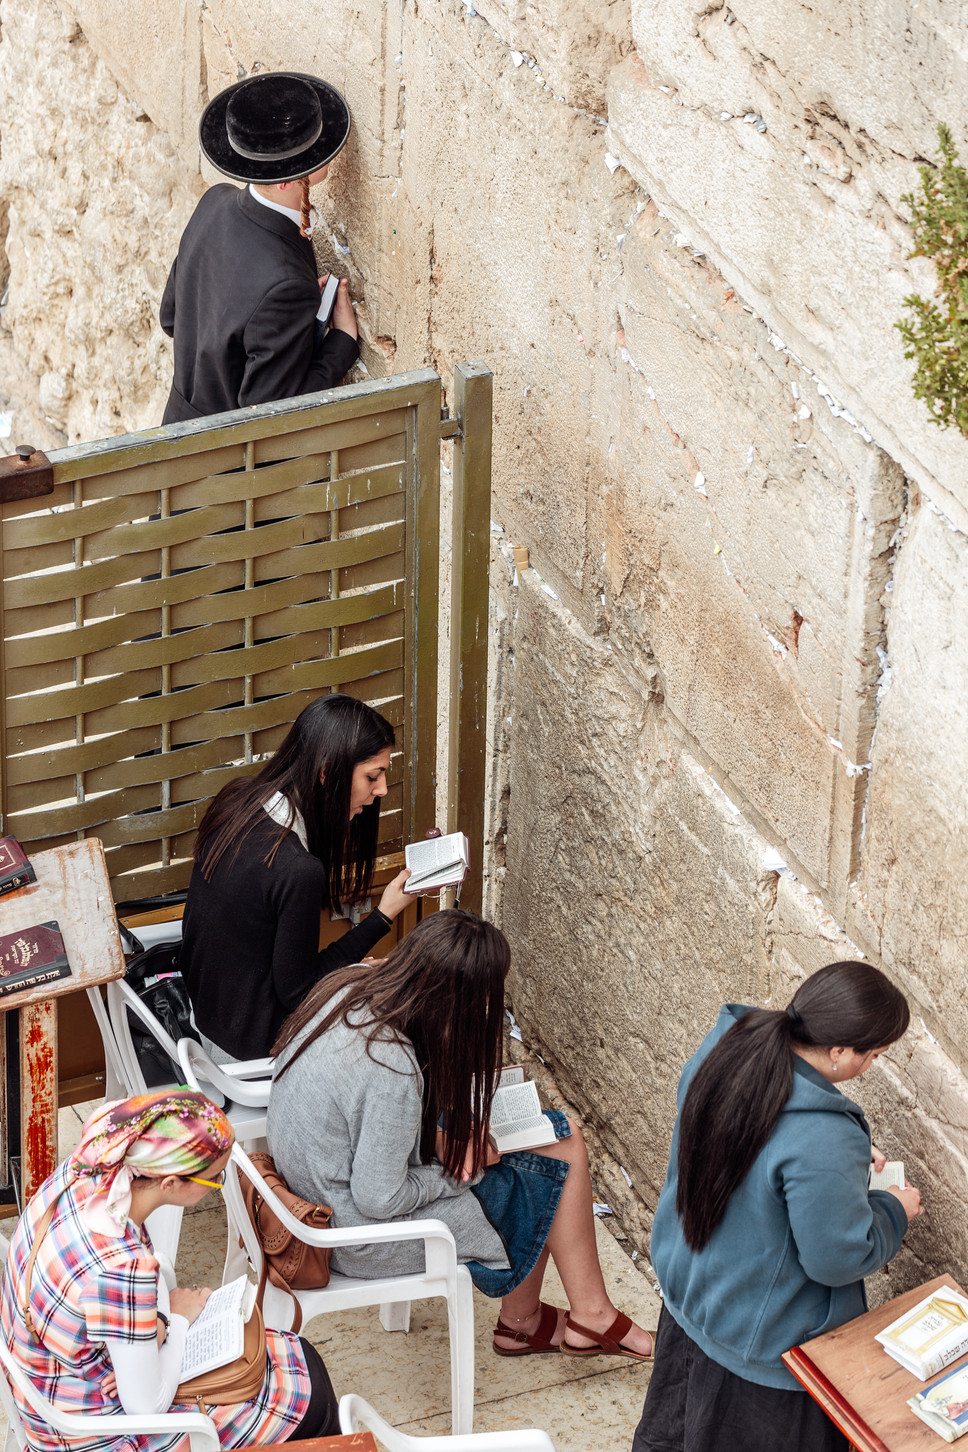 Jerusalem_People_Women at the Kotel 4.jp